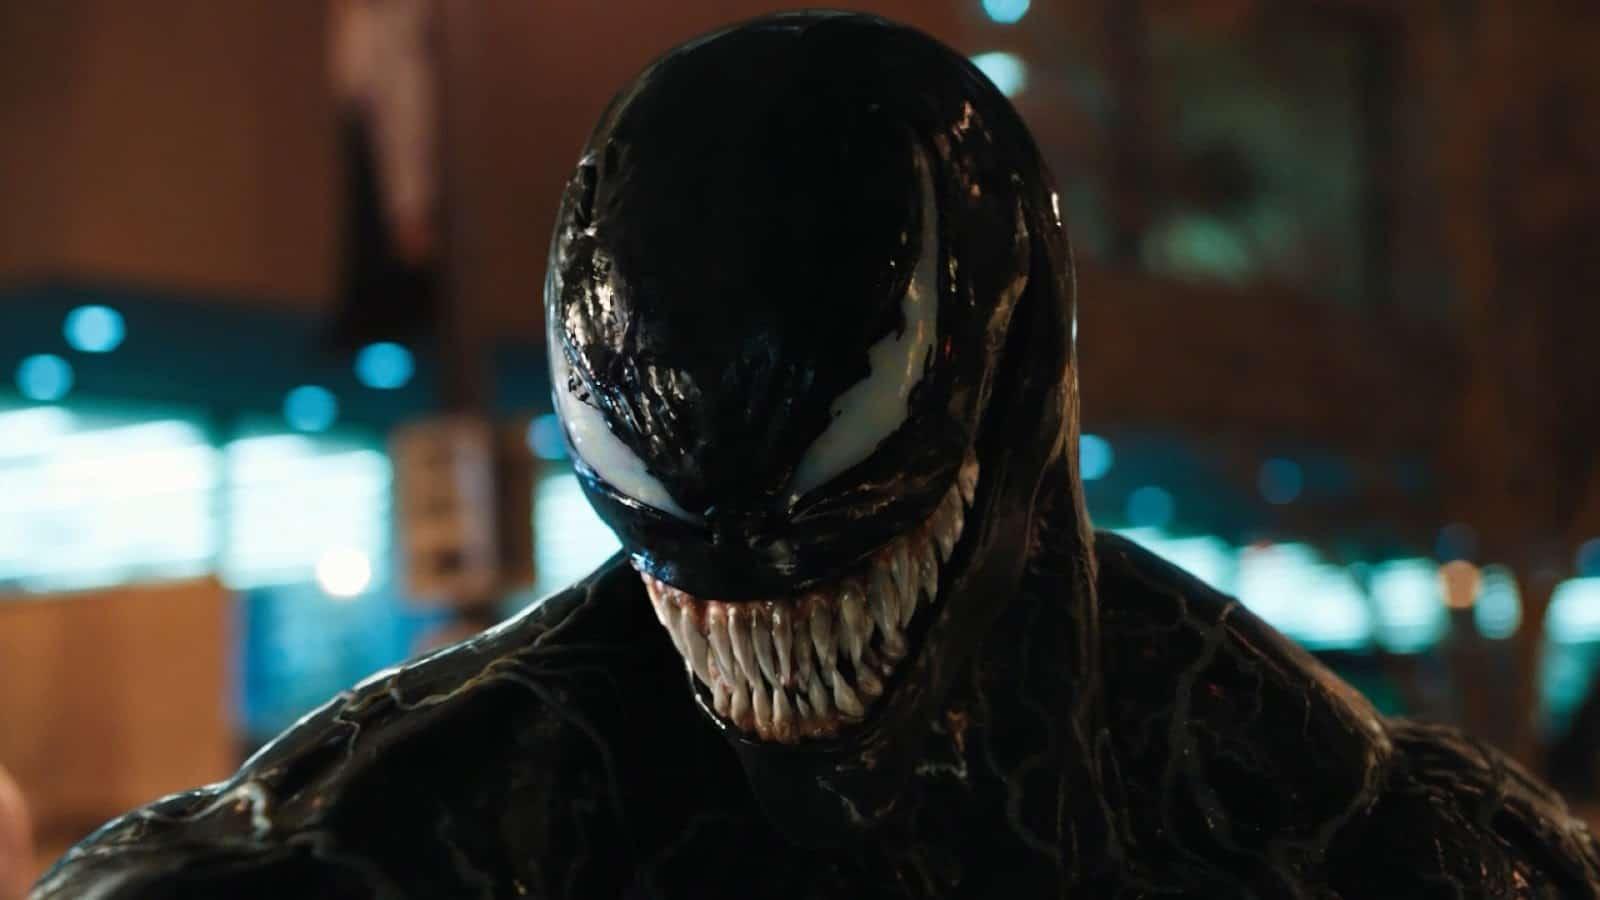 Tom Hardy Venom Feels Like a Superhero Movie from 2004 throwback Ruben Fleischer